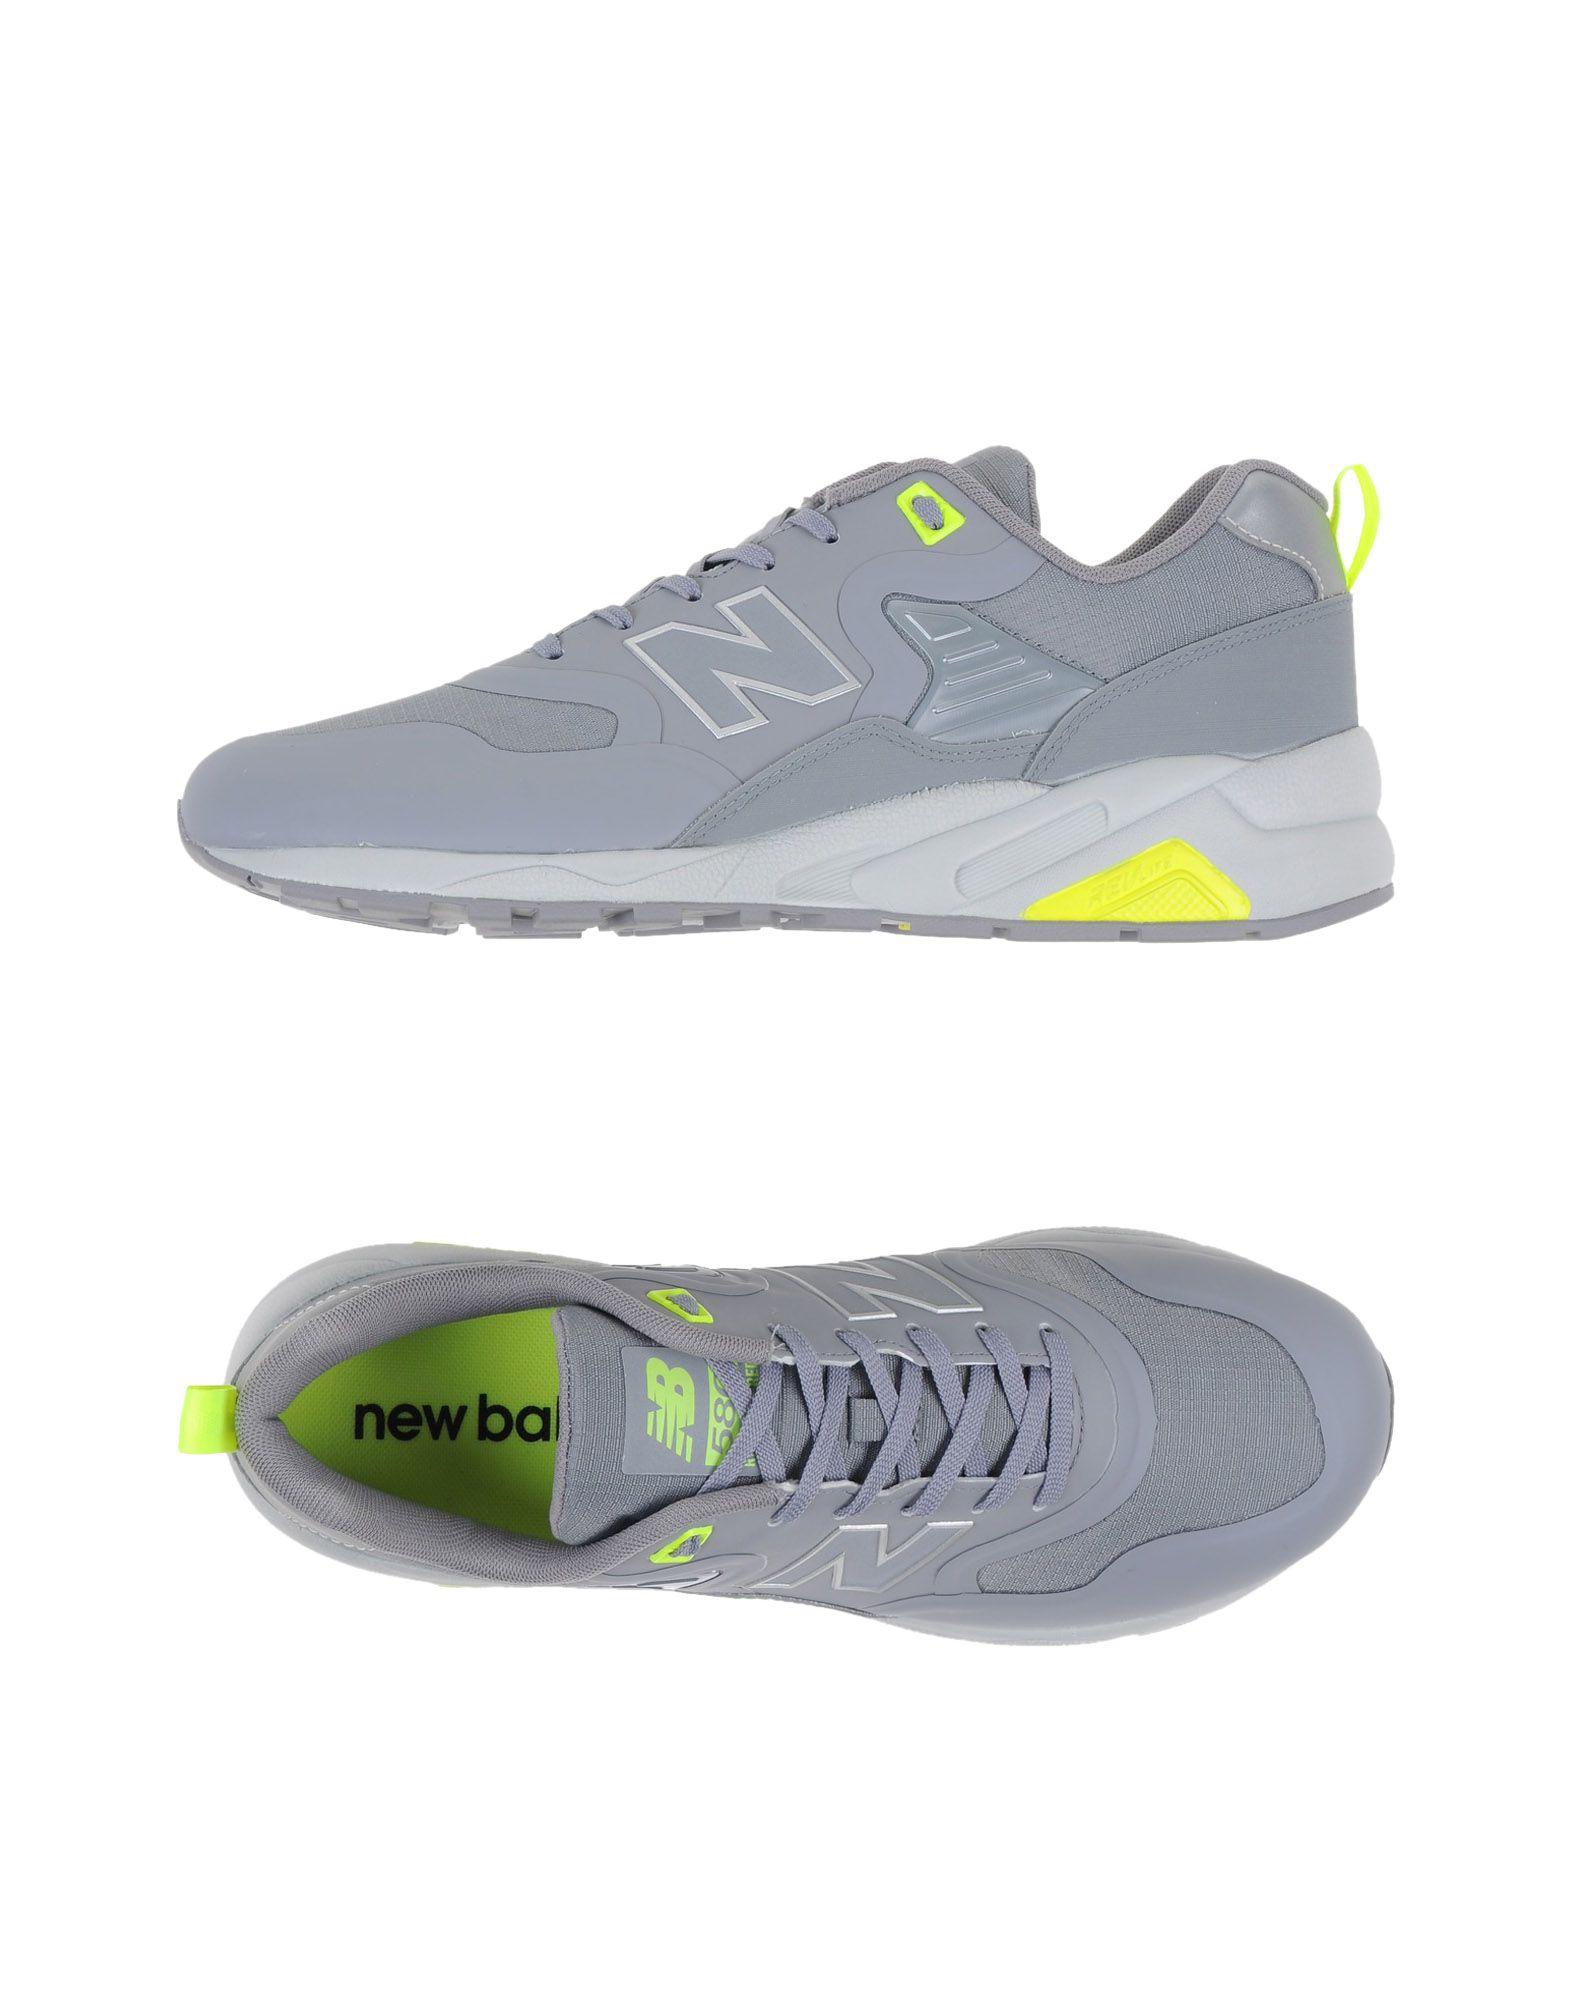 Rabatt 580 echte Schuhe New Balance 580 Rabatt Brights  44993868XW ed23e9